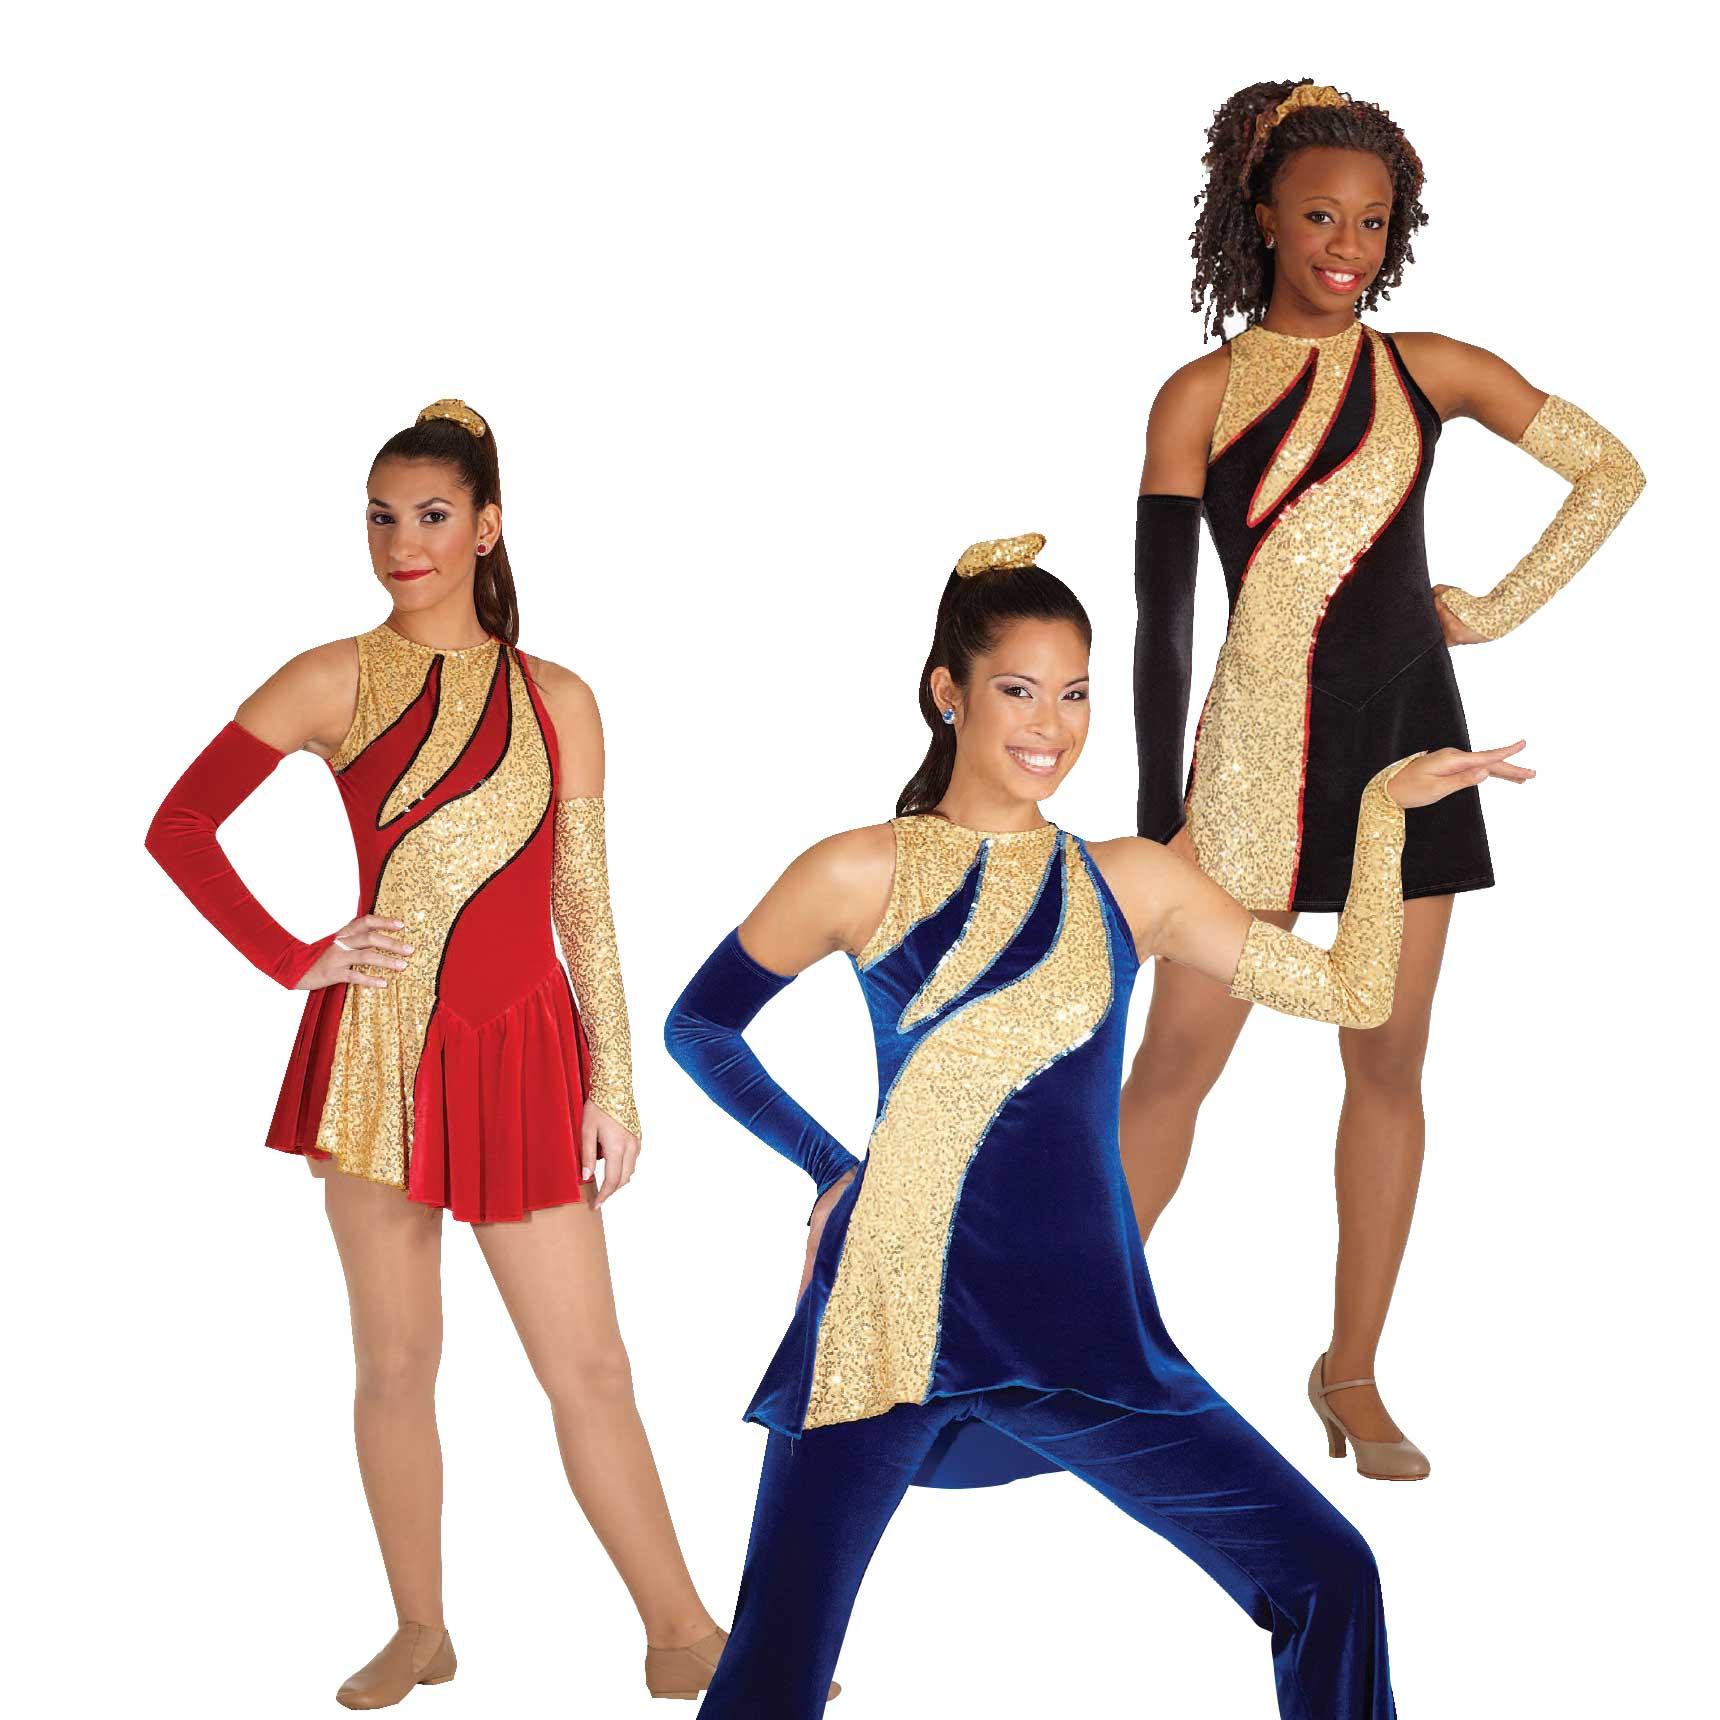 Guard Uniforms: Style 2005